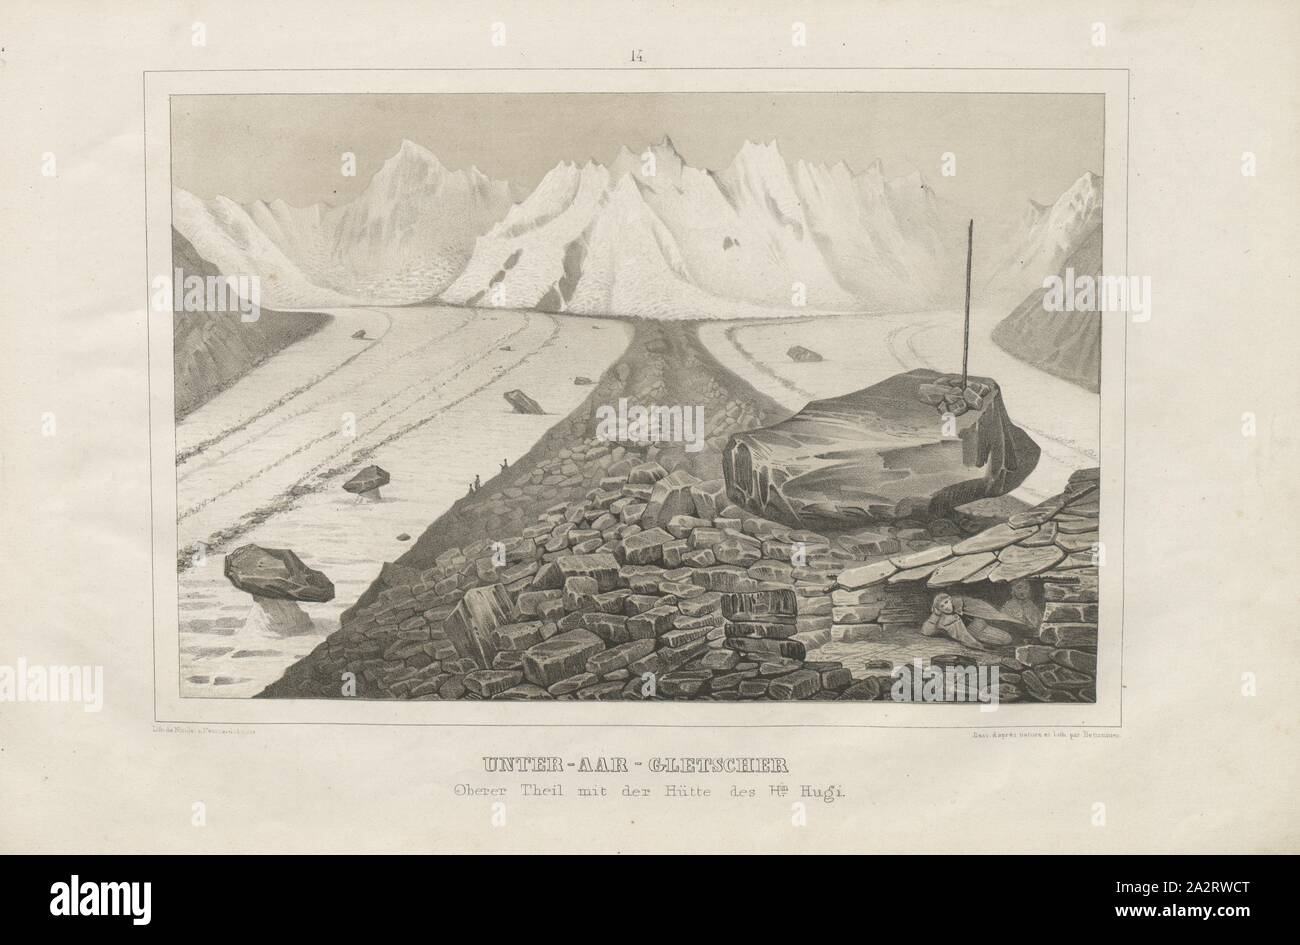 Under - aar glacier, Illustration of the upper part of the Unteraar Glacier and the hut of Hn., 19th century Hugi, signed: Lith. De Nicolet a Neuchatel, Suisse, Dess., d'apres nature et lith, par Bettanier, Plate 14, p. 34, Nicolet (lith.); Bettanier (des. & lith.), 1840, Louis Agassiz: Untersuchungen über die Gletscher. [Tafelband]. Solothurn: in Kommission bei Jent & Gassmann, 1841 Stock Photo